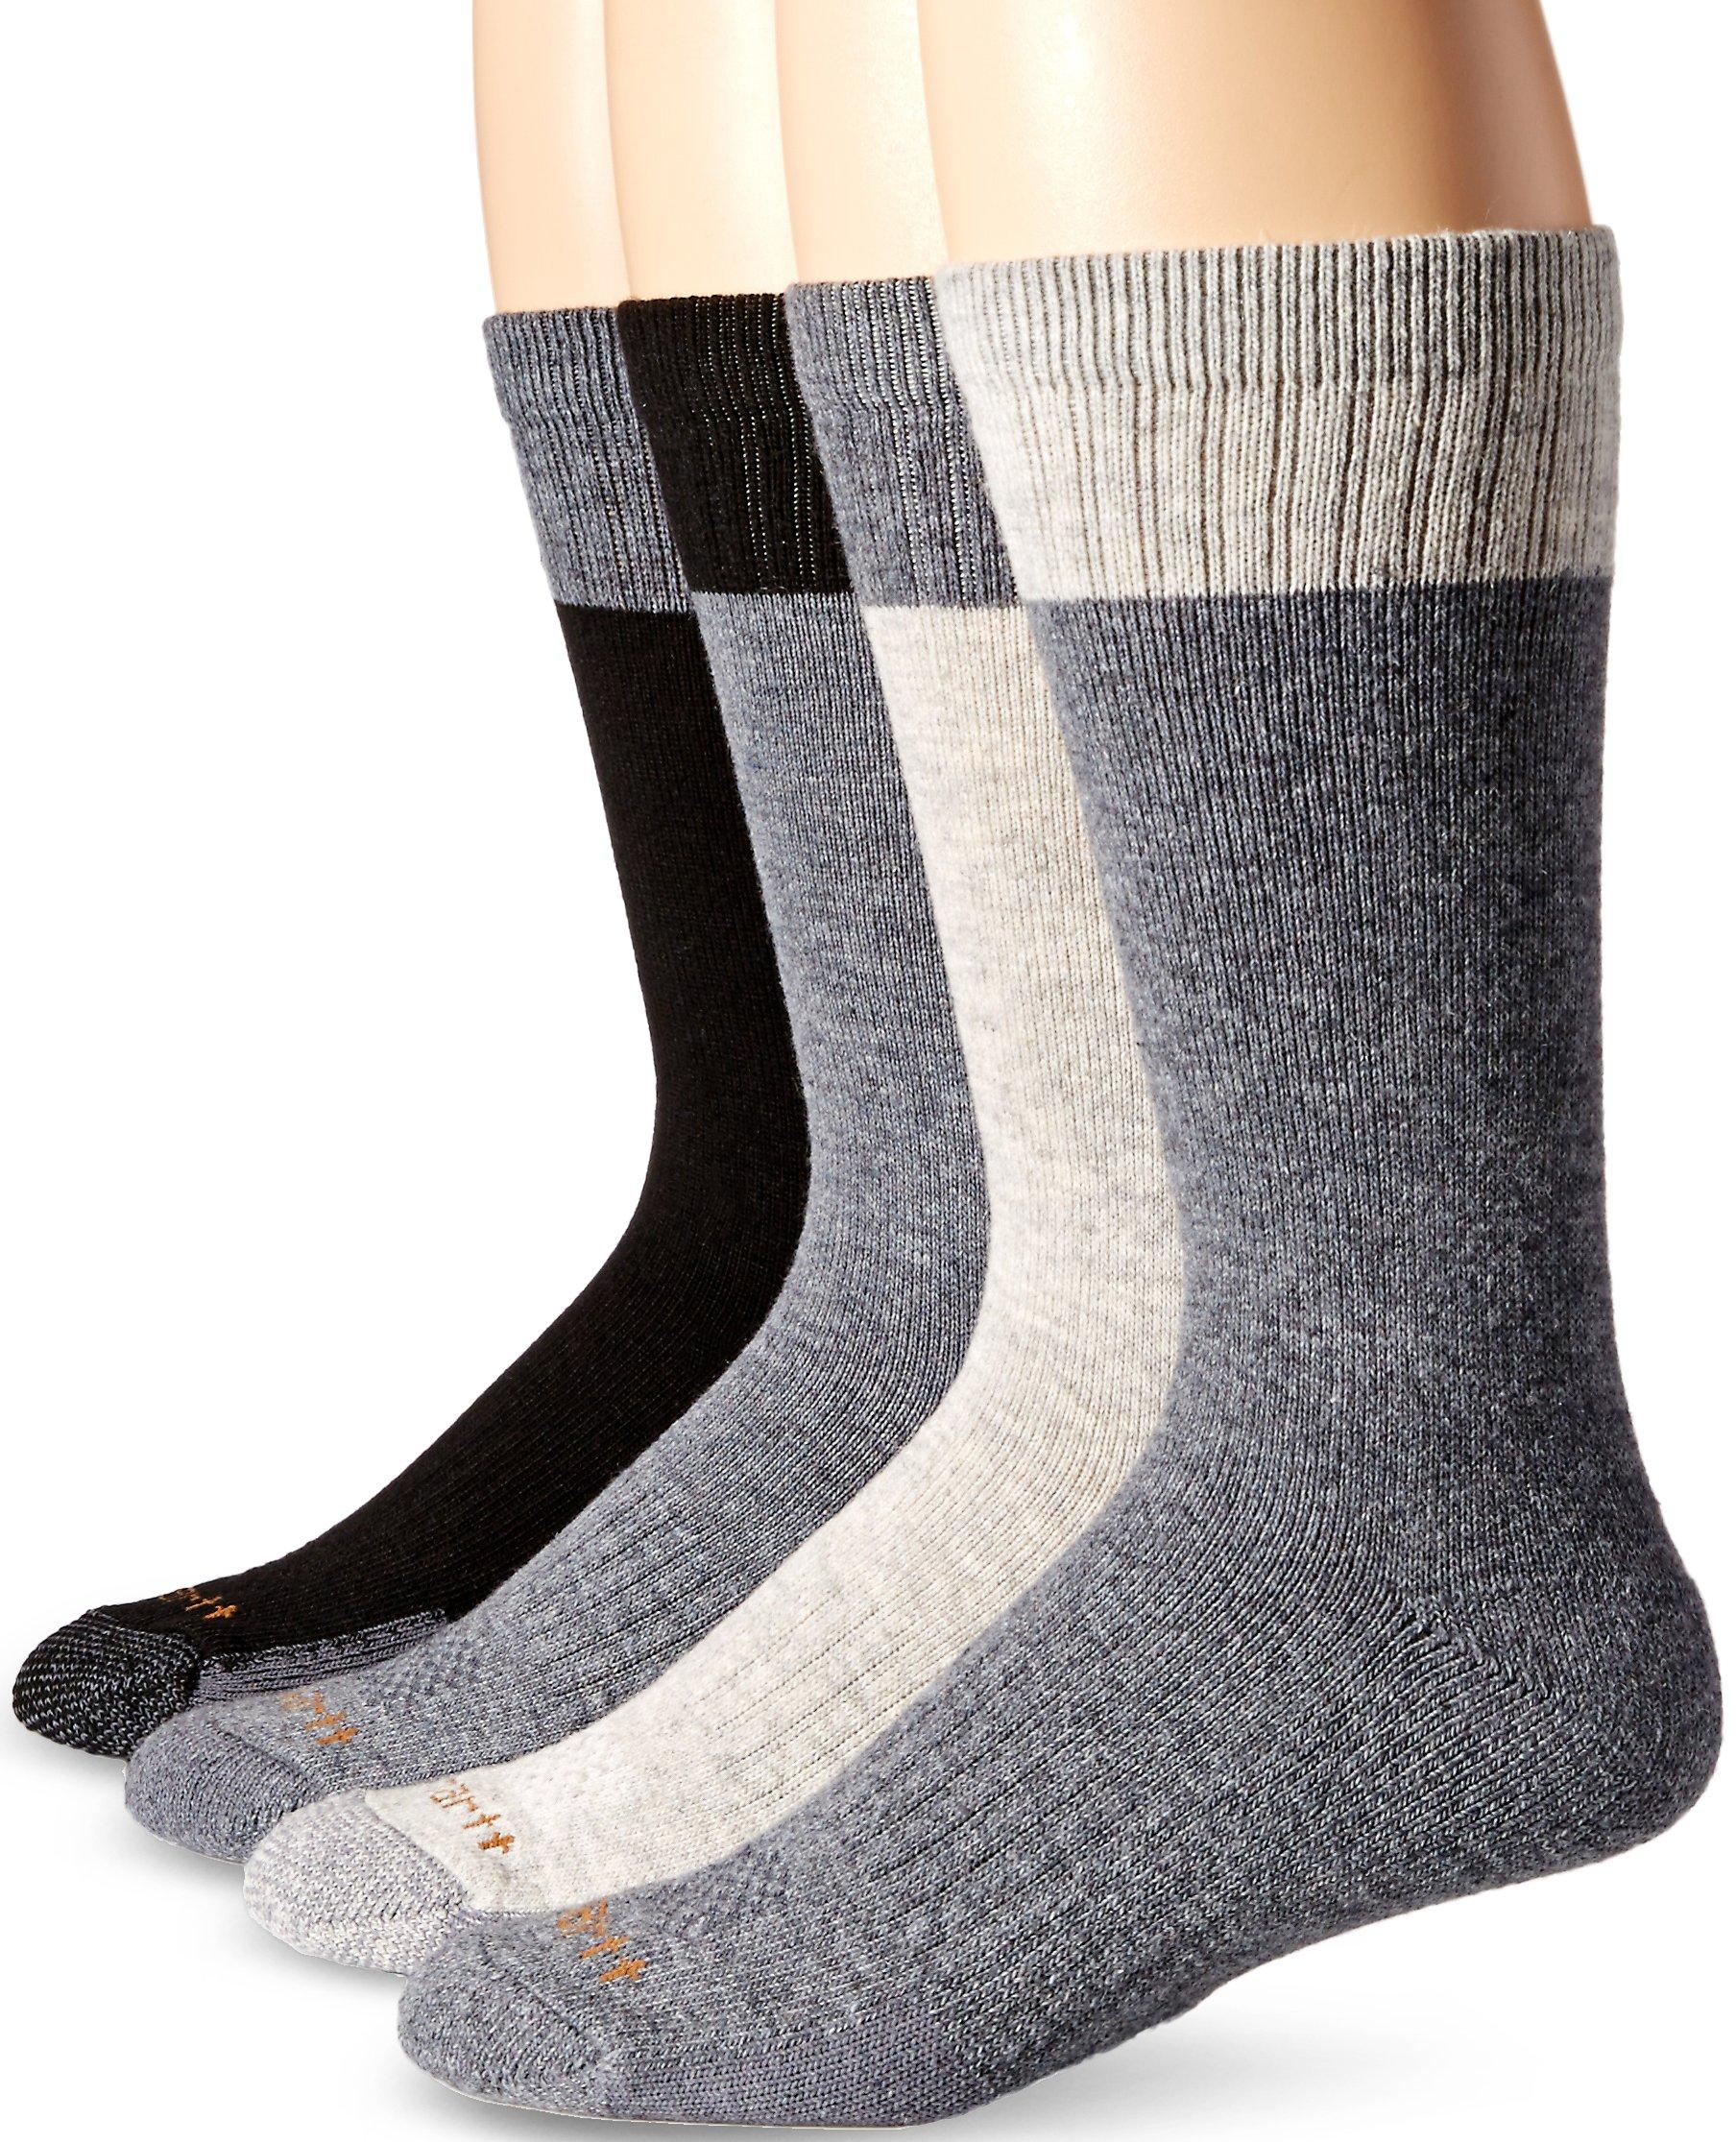 Carhartt Men's Comfort and Durability Crew Sock 4 Pack, Black, Sock Size: 10-13/Shoe Size:9-11